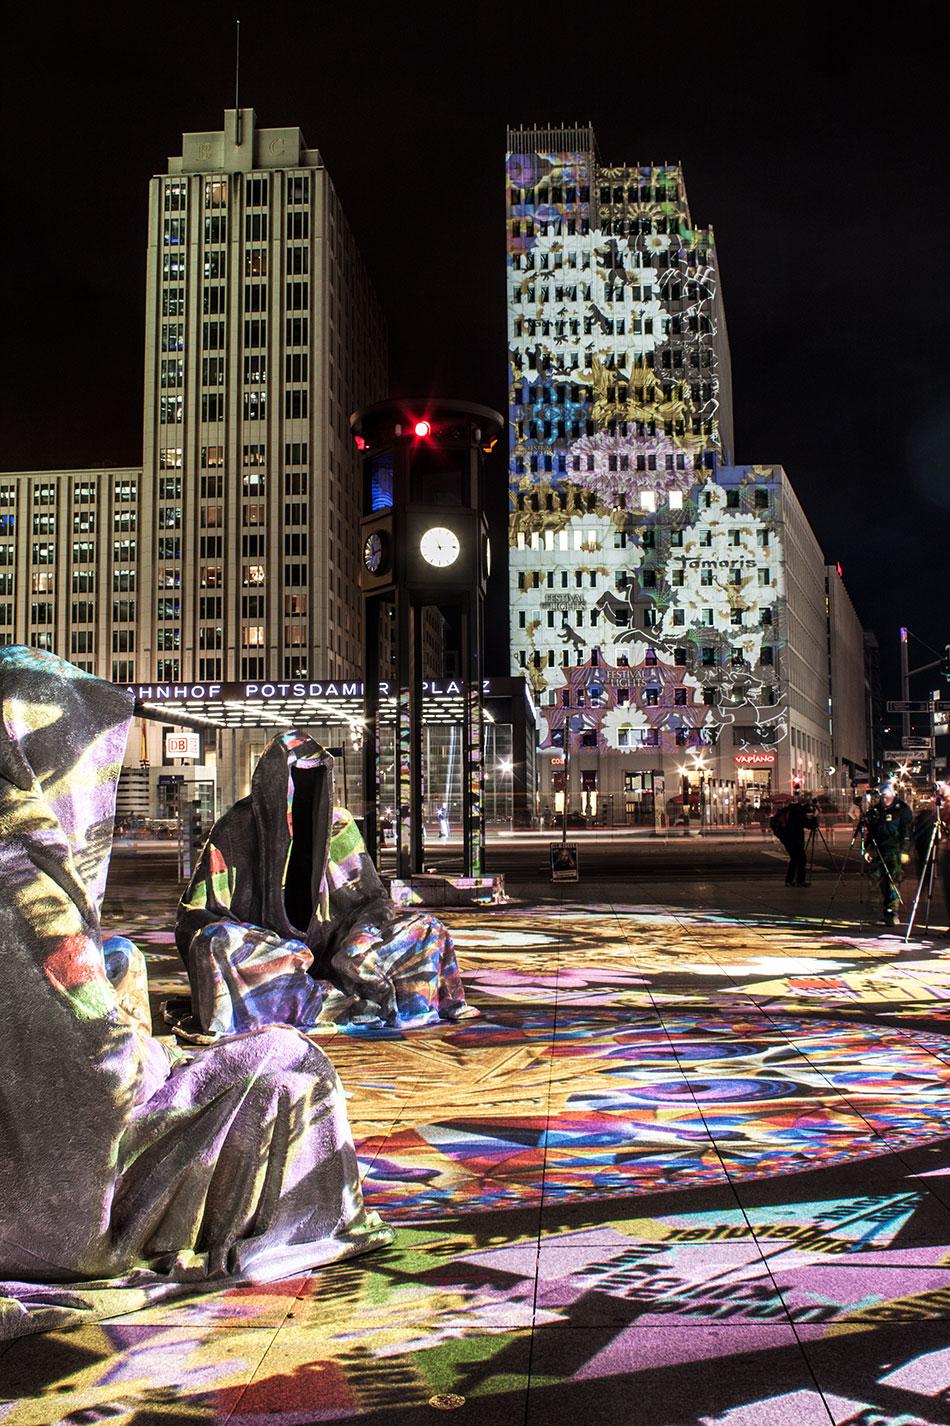 festival-of-lights-berlin-potzdamer-platz-light-art-show-exhibition-lumina-guardians-of-time-manfred-kili-kielnhofer-contemporary-arts-design-large-scale-monumental-public-sculpture-3516